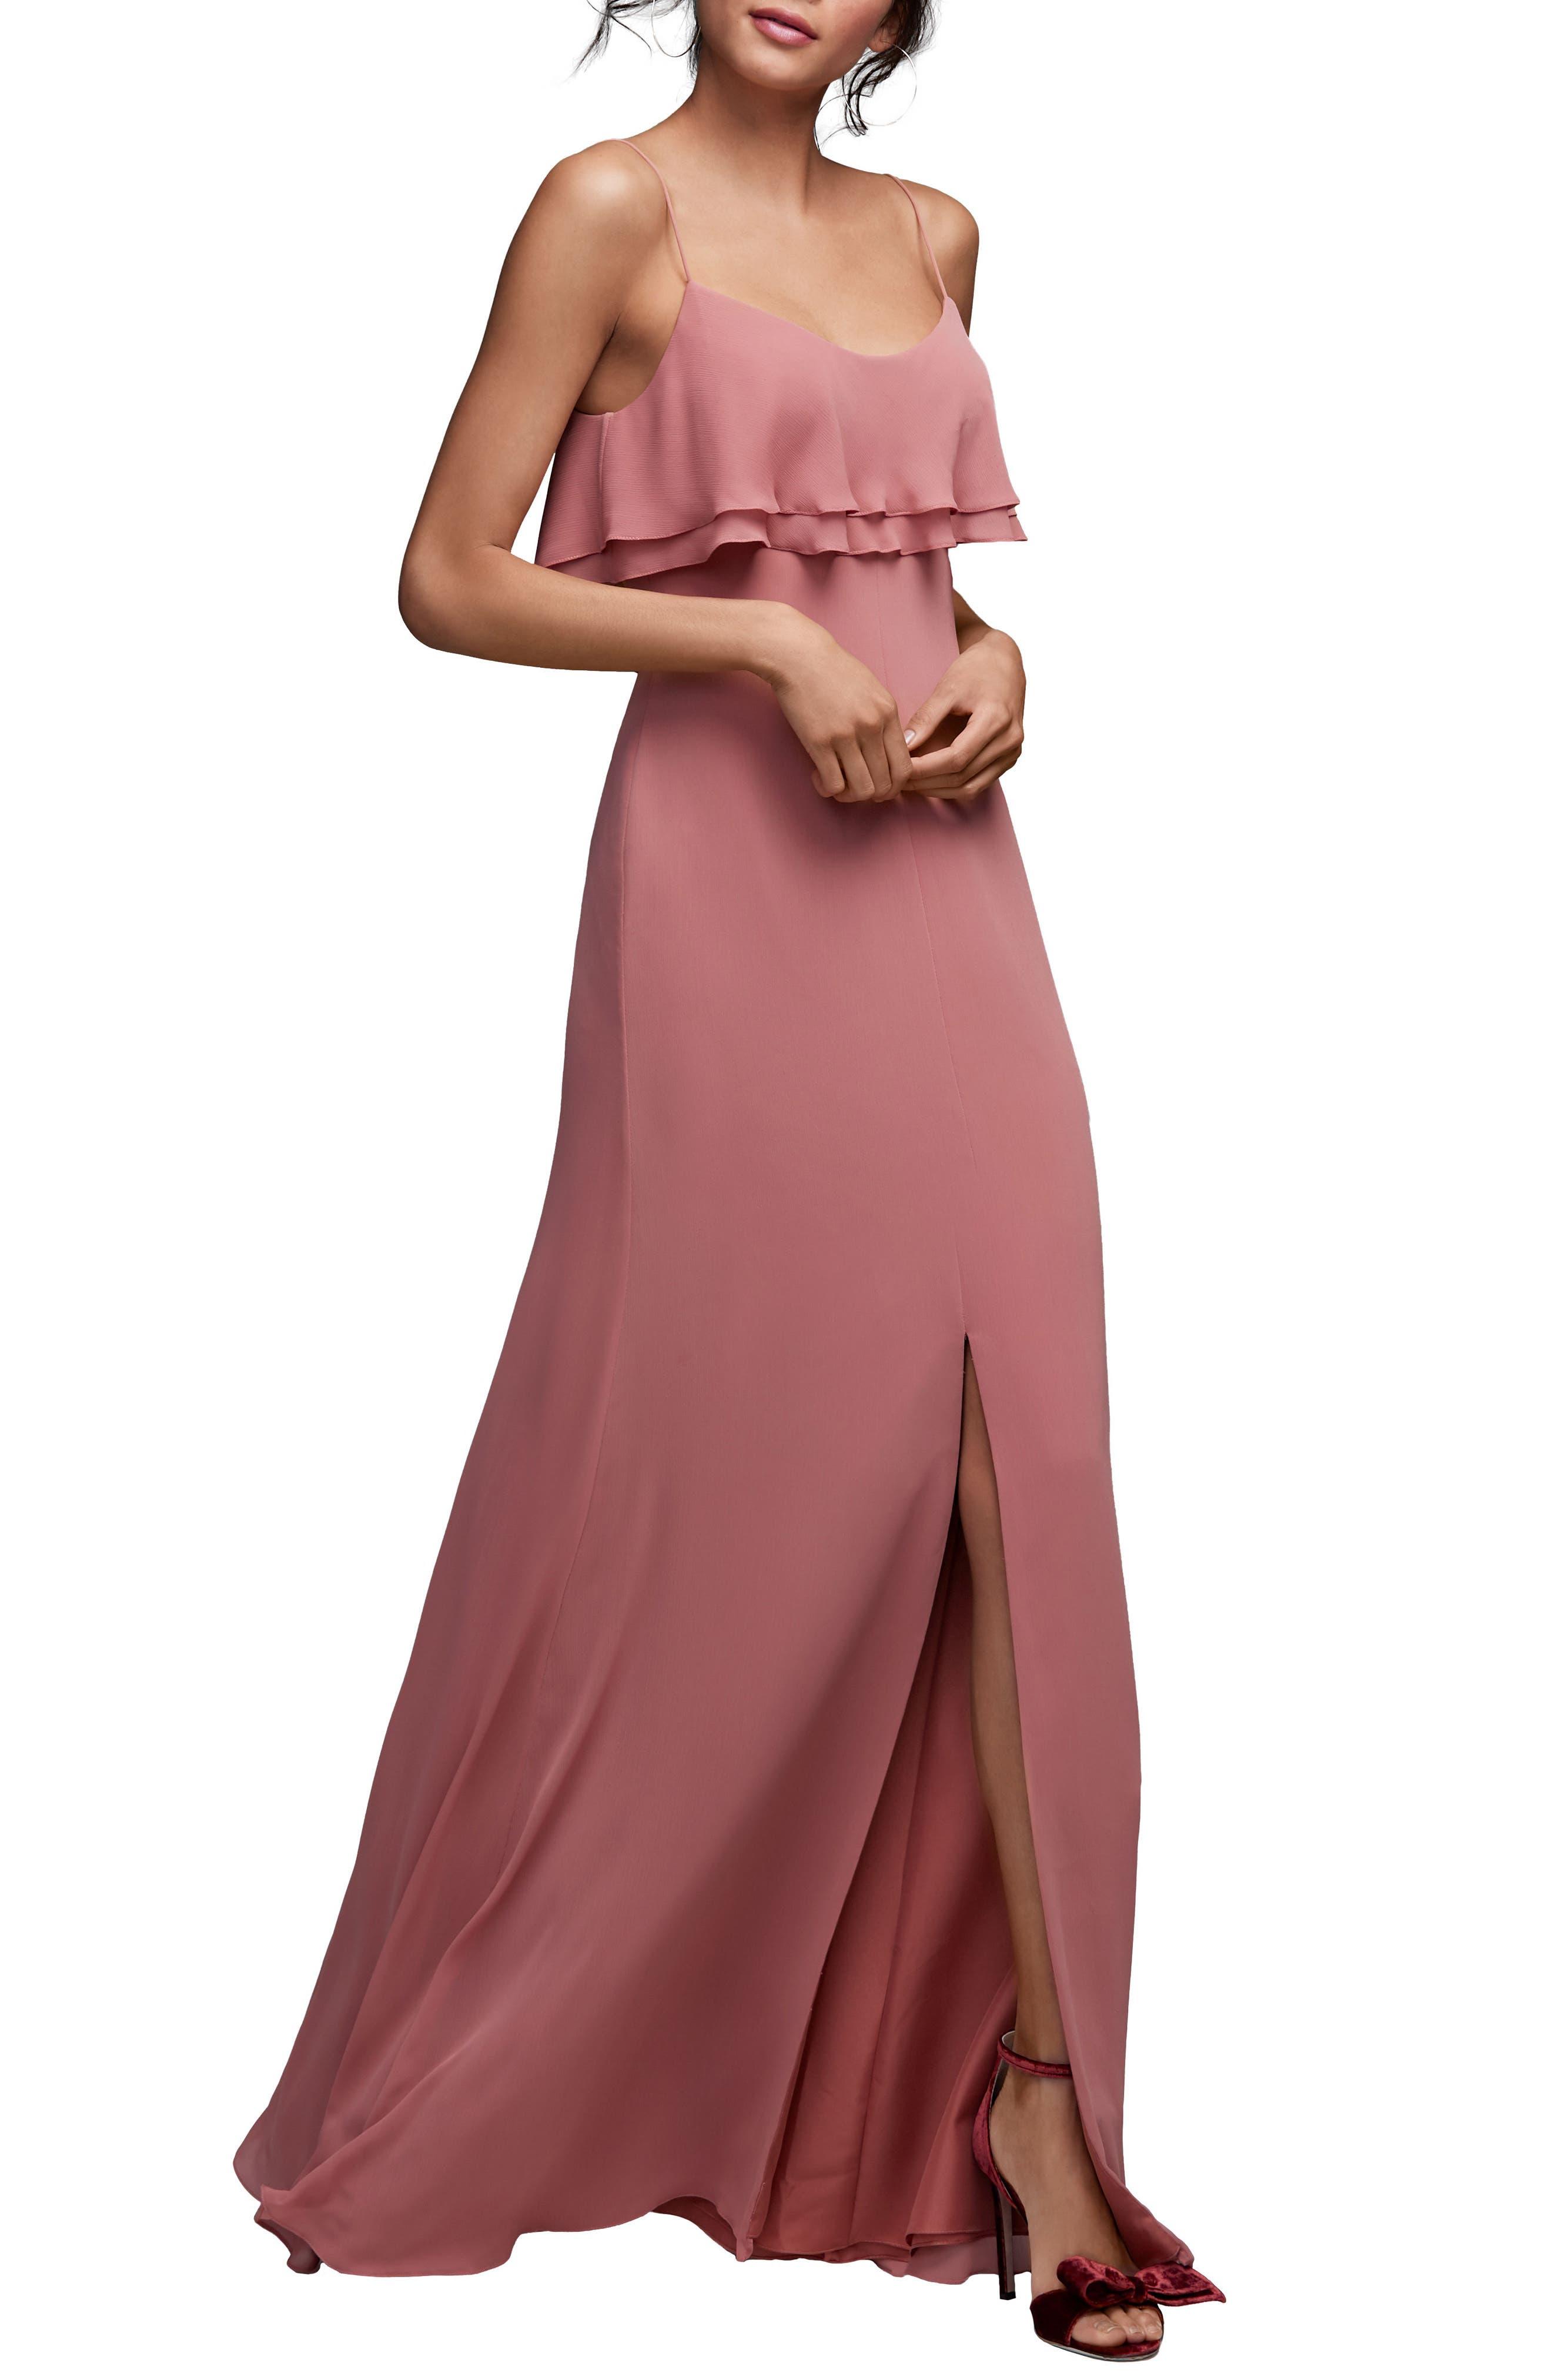 Jasper Ruffle Popover Gown,                             Main thumbnail 1, color,                             650